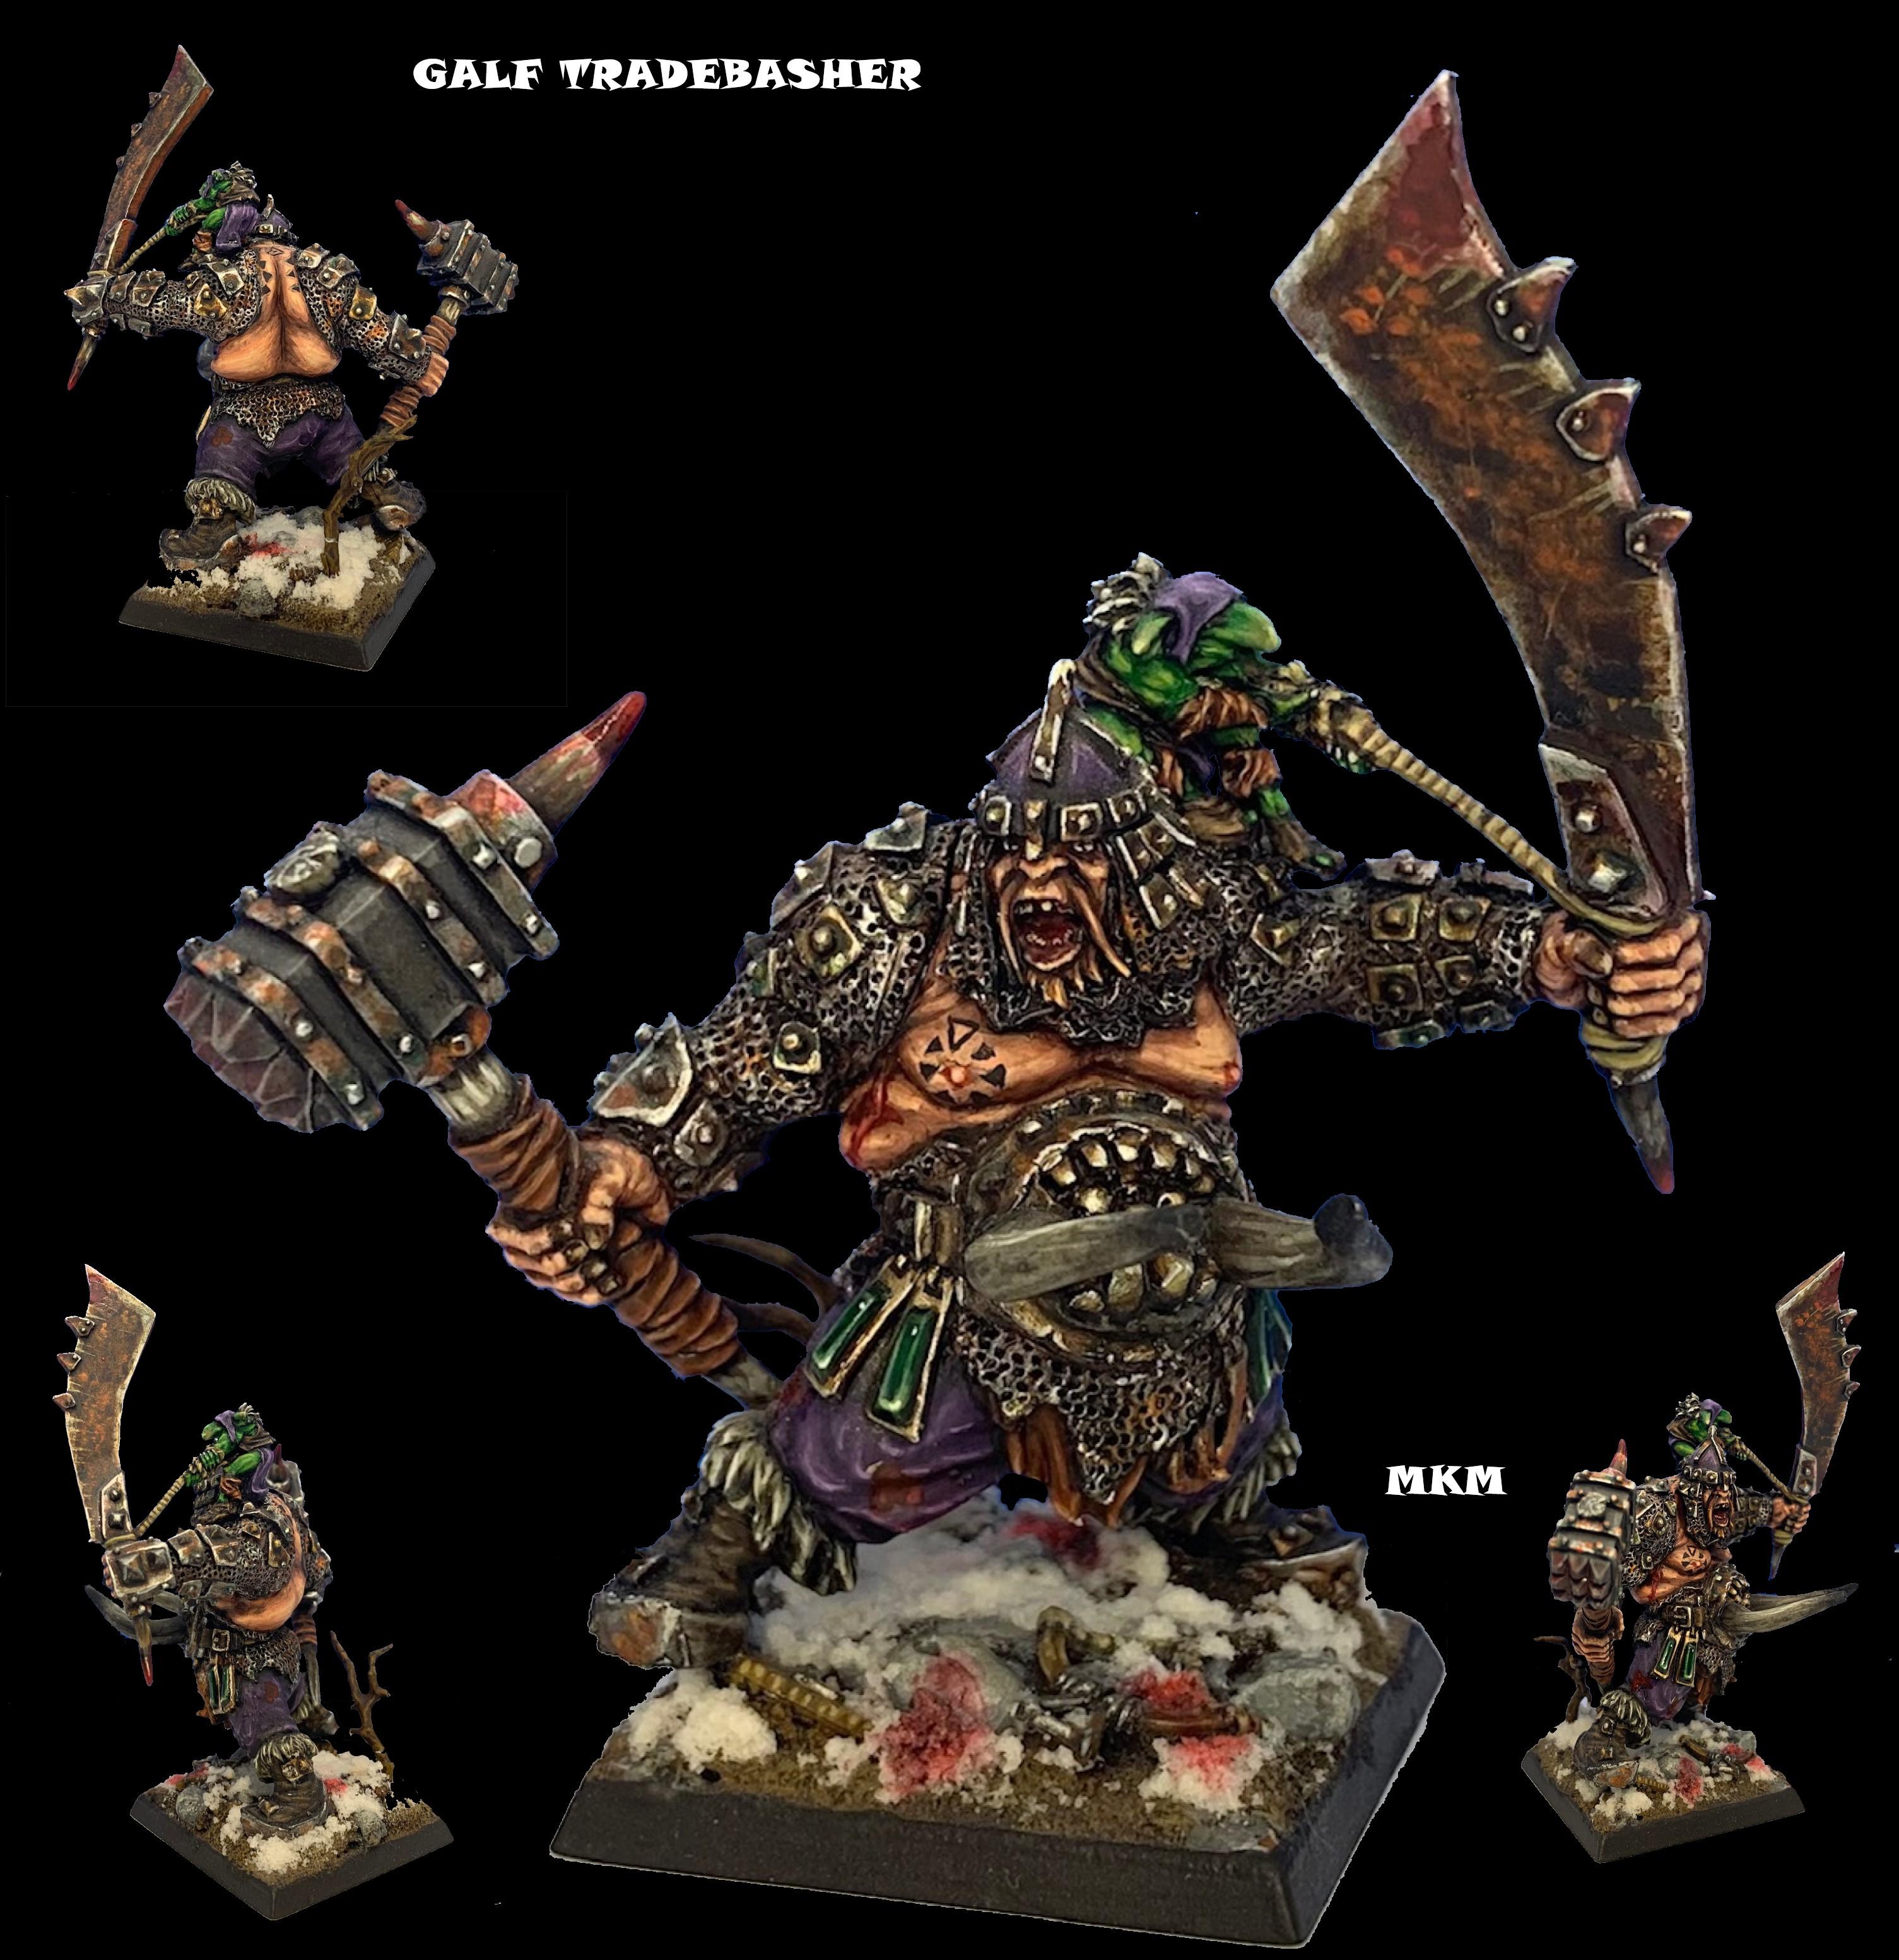 GALF TRADEBASHER - Ogre Tyrant